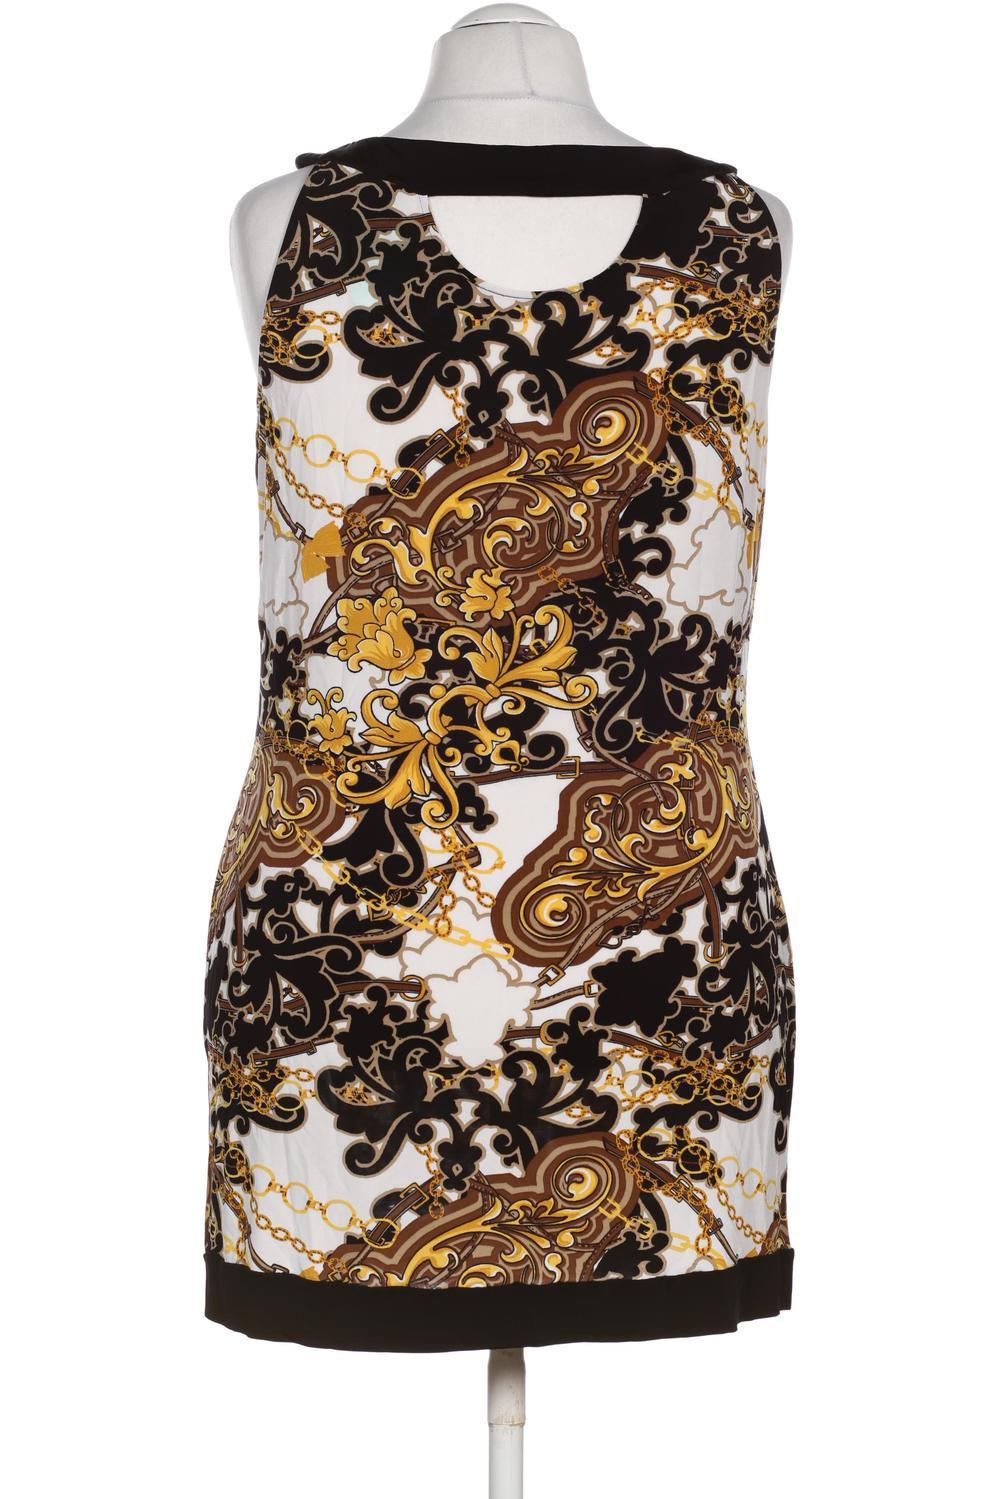 s.Oliver Selection Damen Kleid DE 44 Second Hand kaufen | ubup